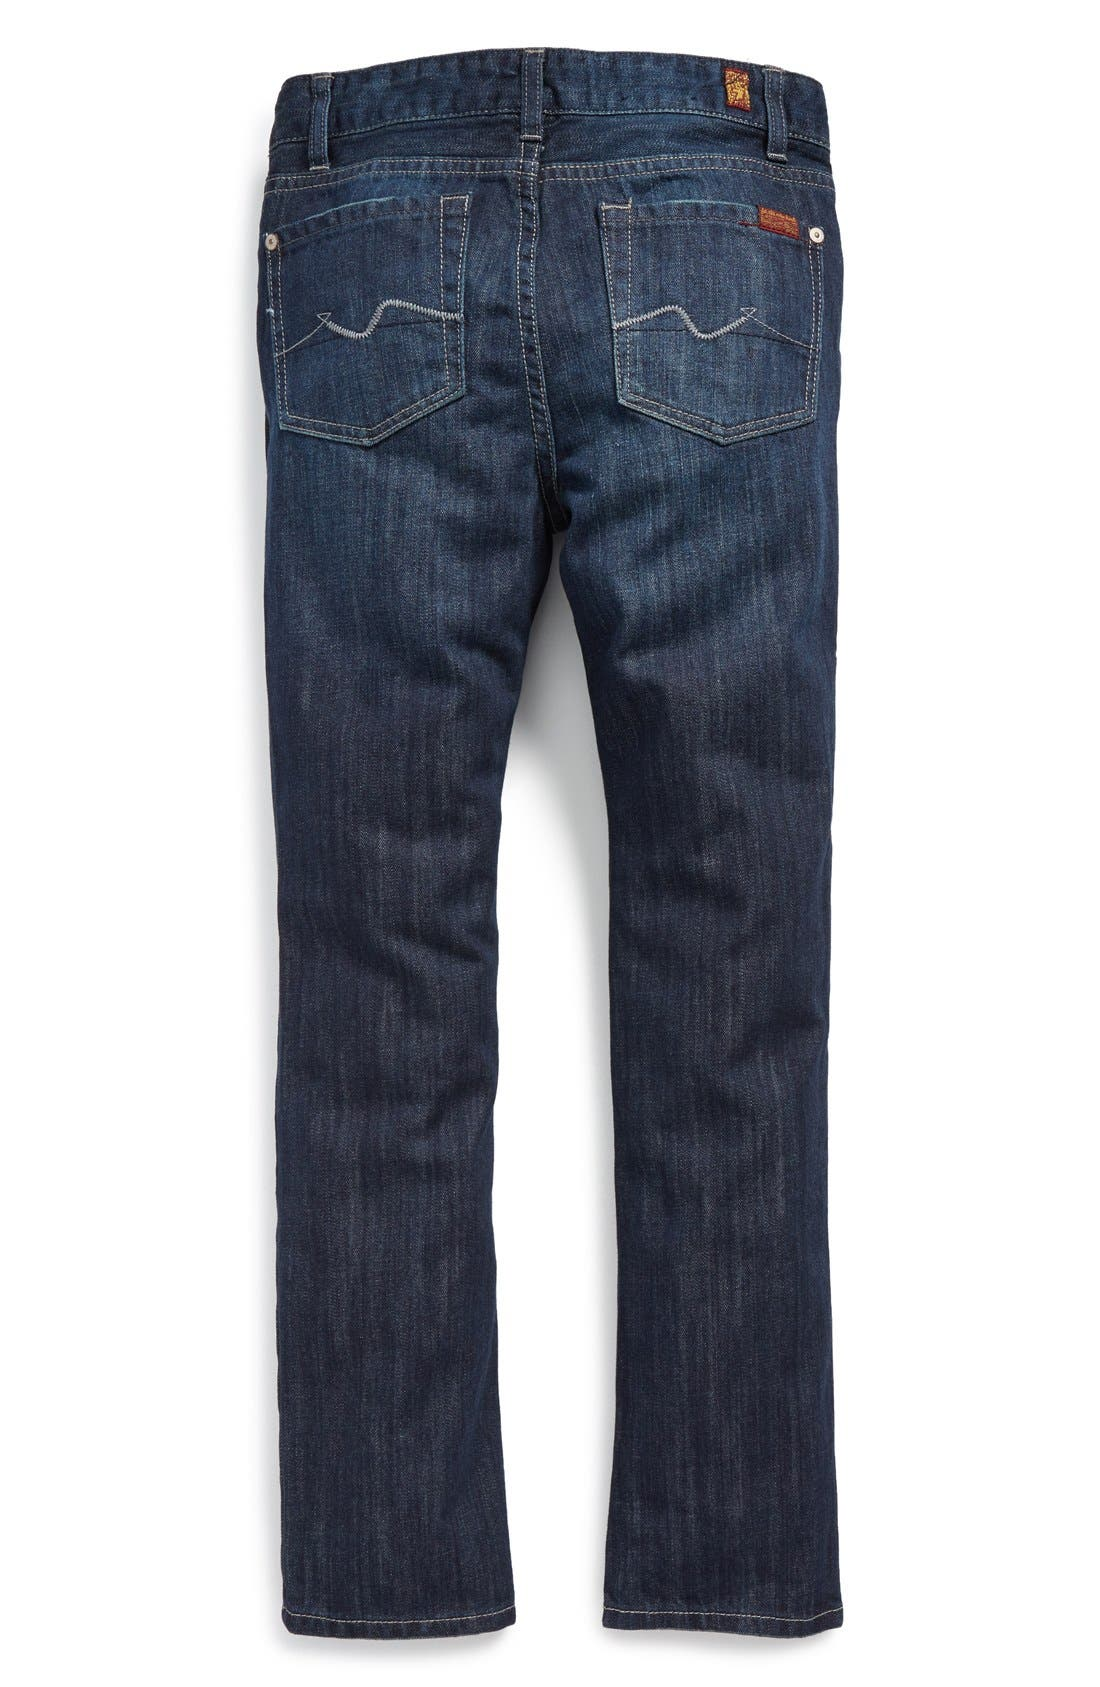 Alternate Image 3  - 7 For All Mankind® 'Slimmy' Jeans (Big Boys)